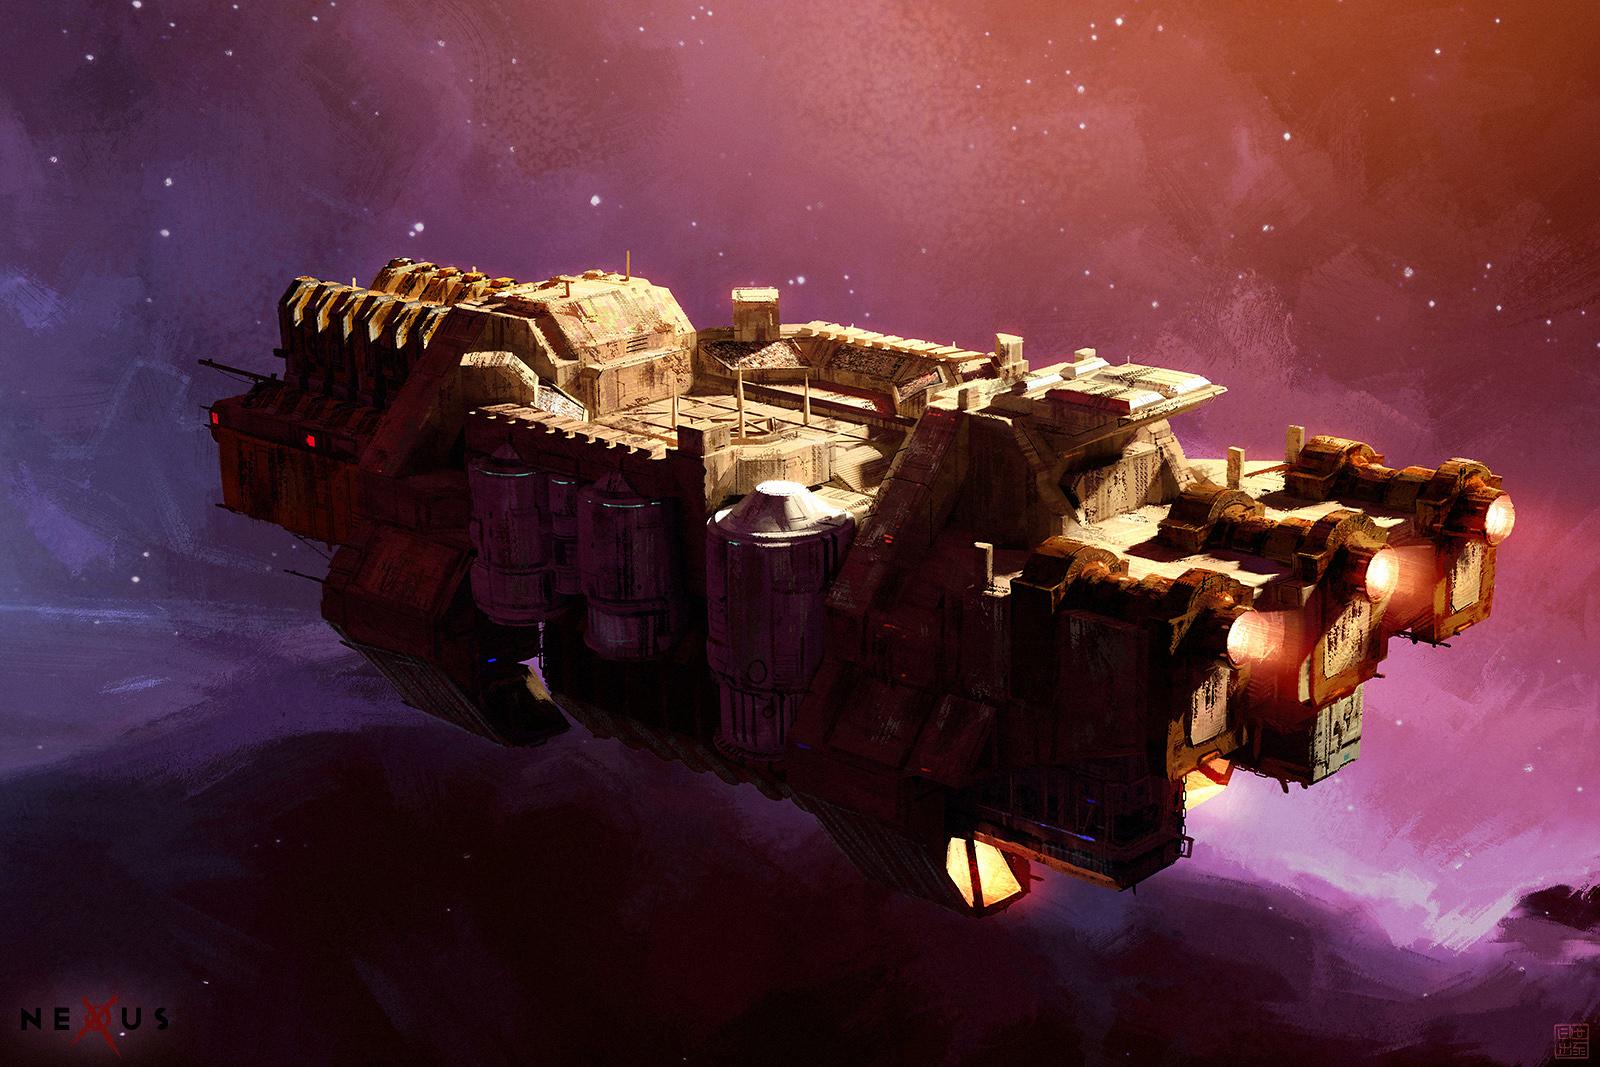 NEXUS - Crate - Space Barge by Hideyoshi